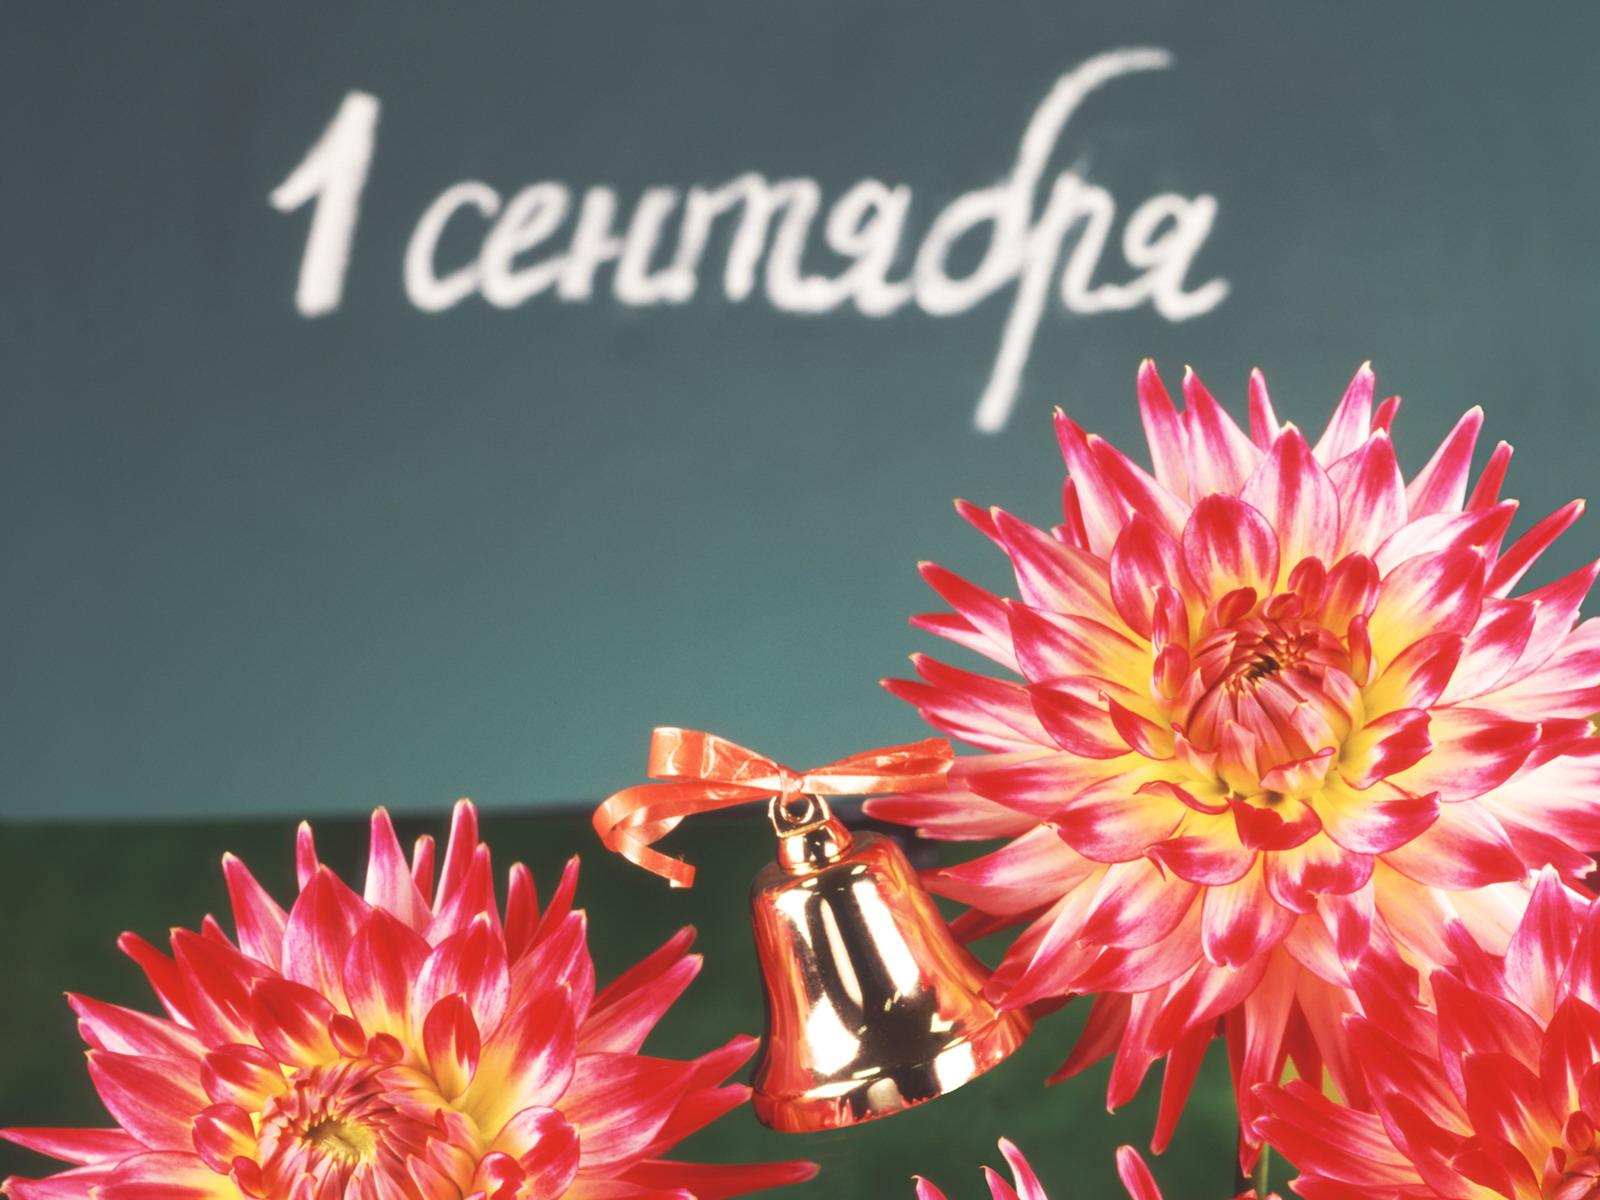 1 сентября день знаний открытки фото, девушки картинки надписями